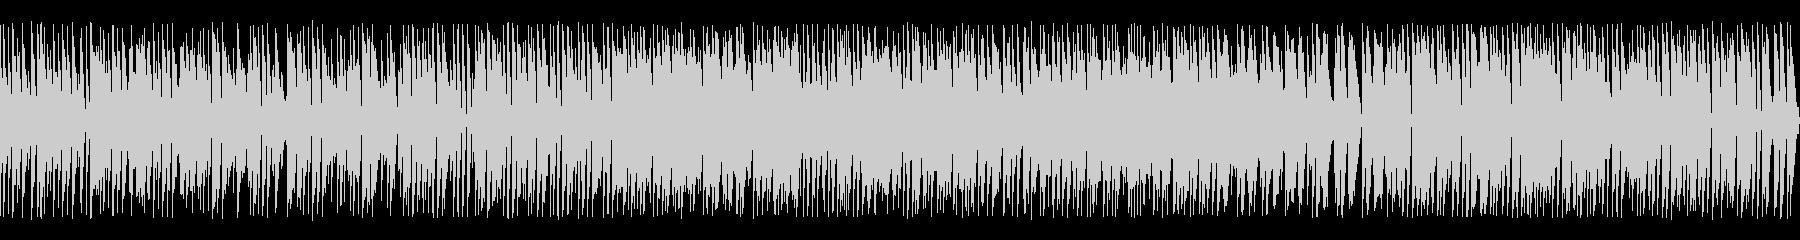 BGM013-06 ファミコンサウンド…の未再生の波形